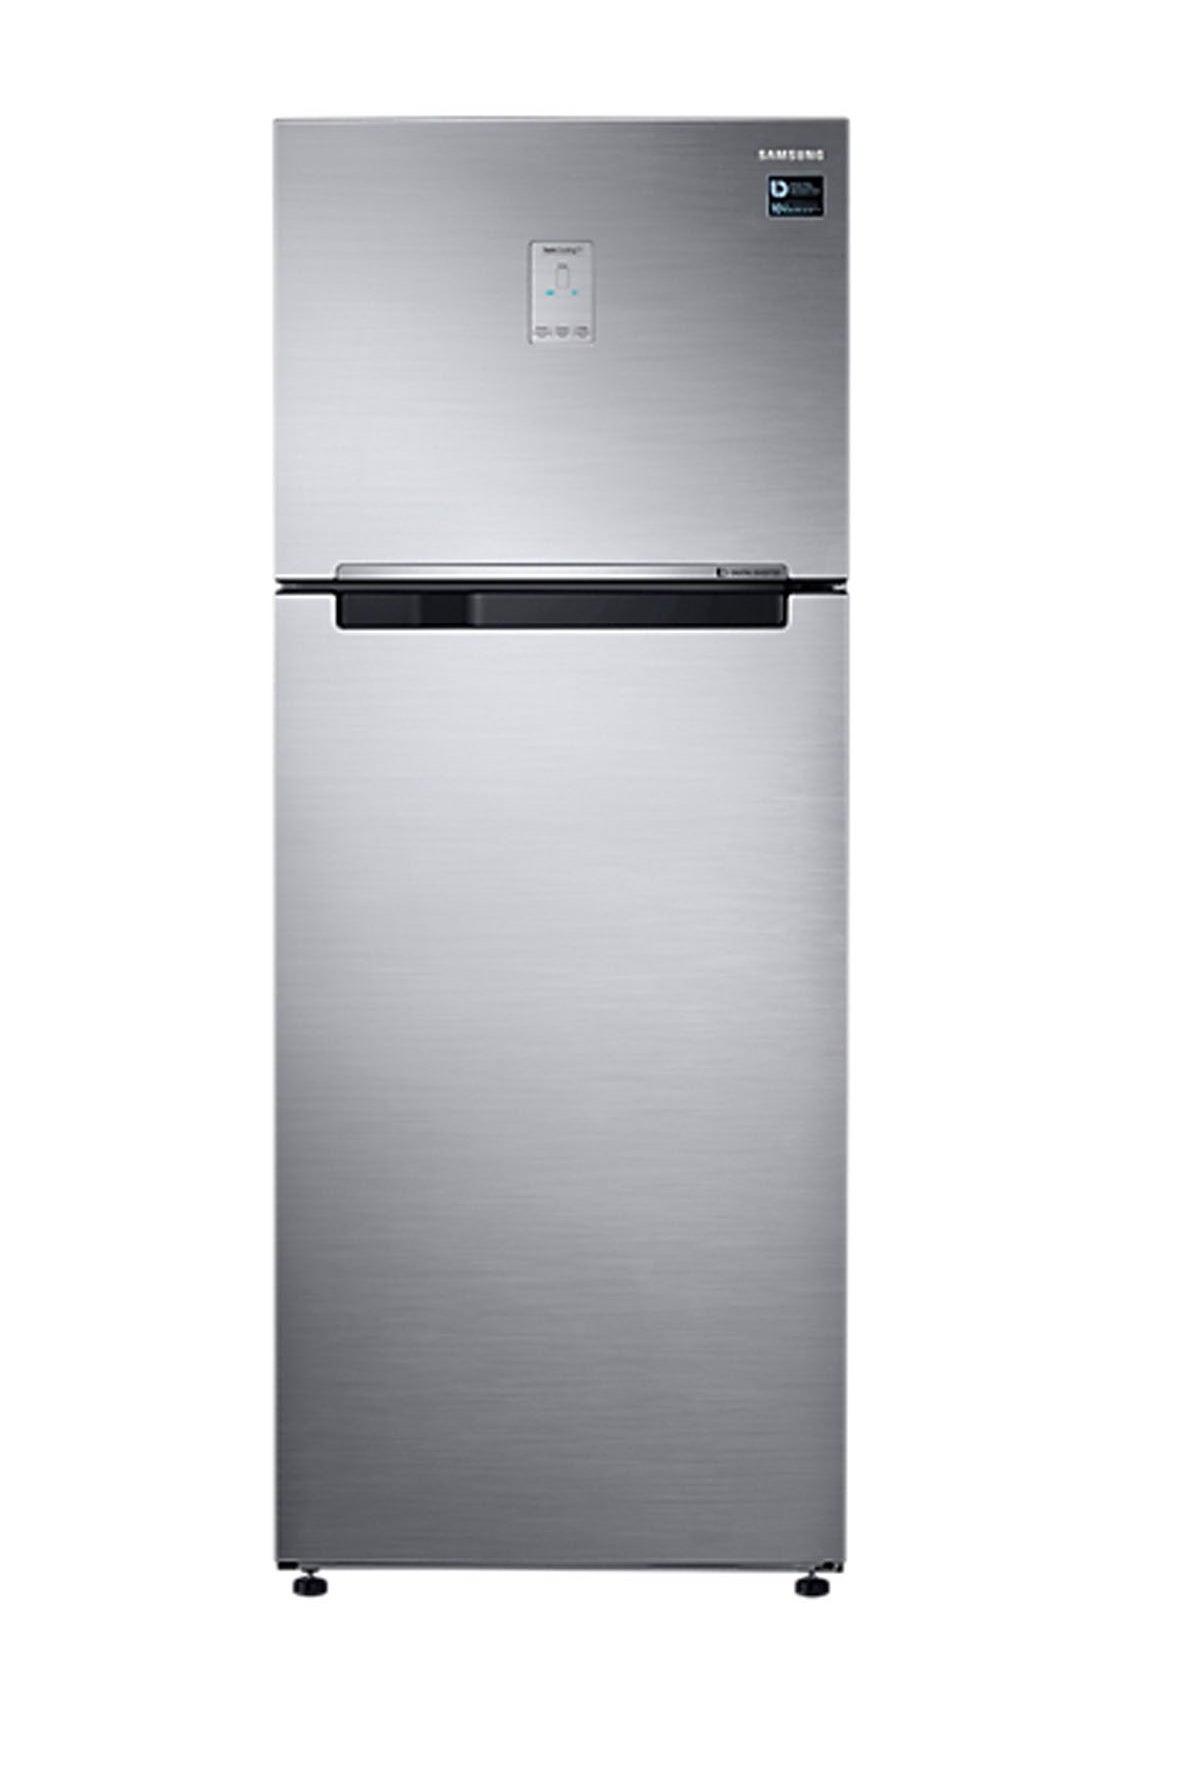 Samsung RT46K6231S8 Refrigerator